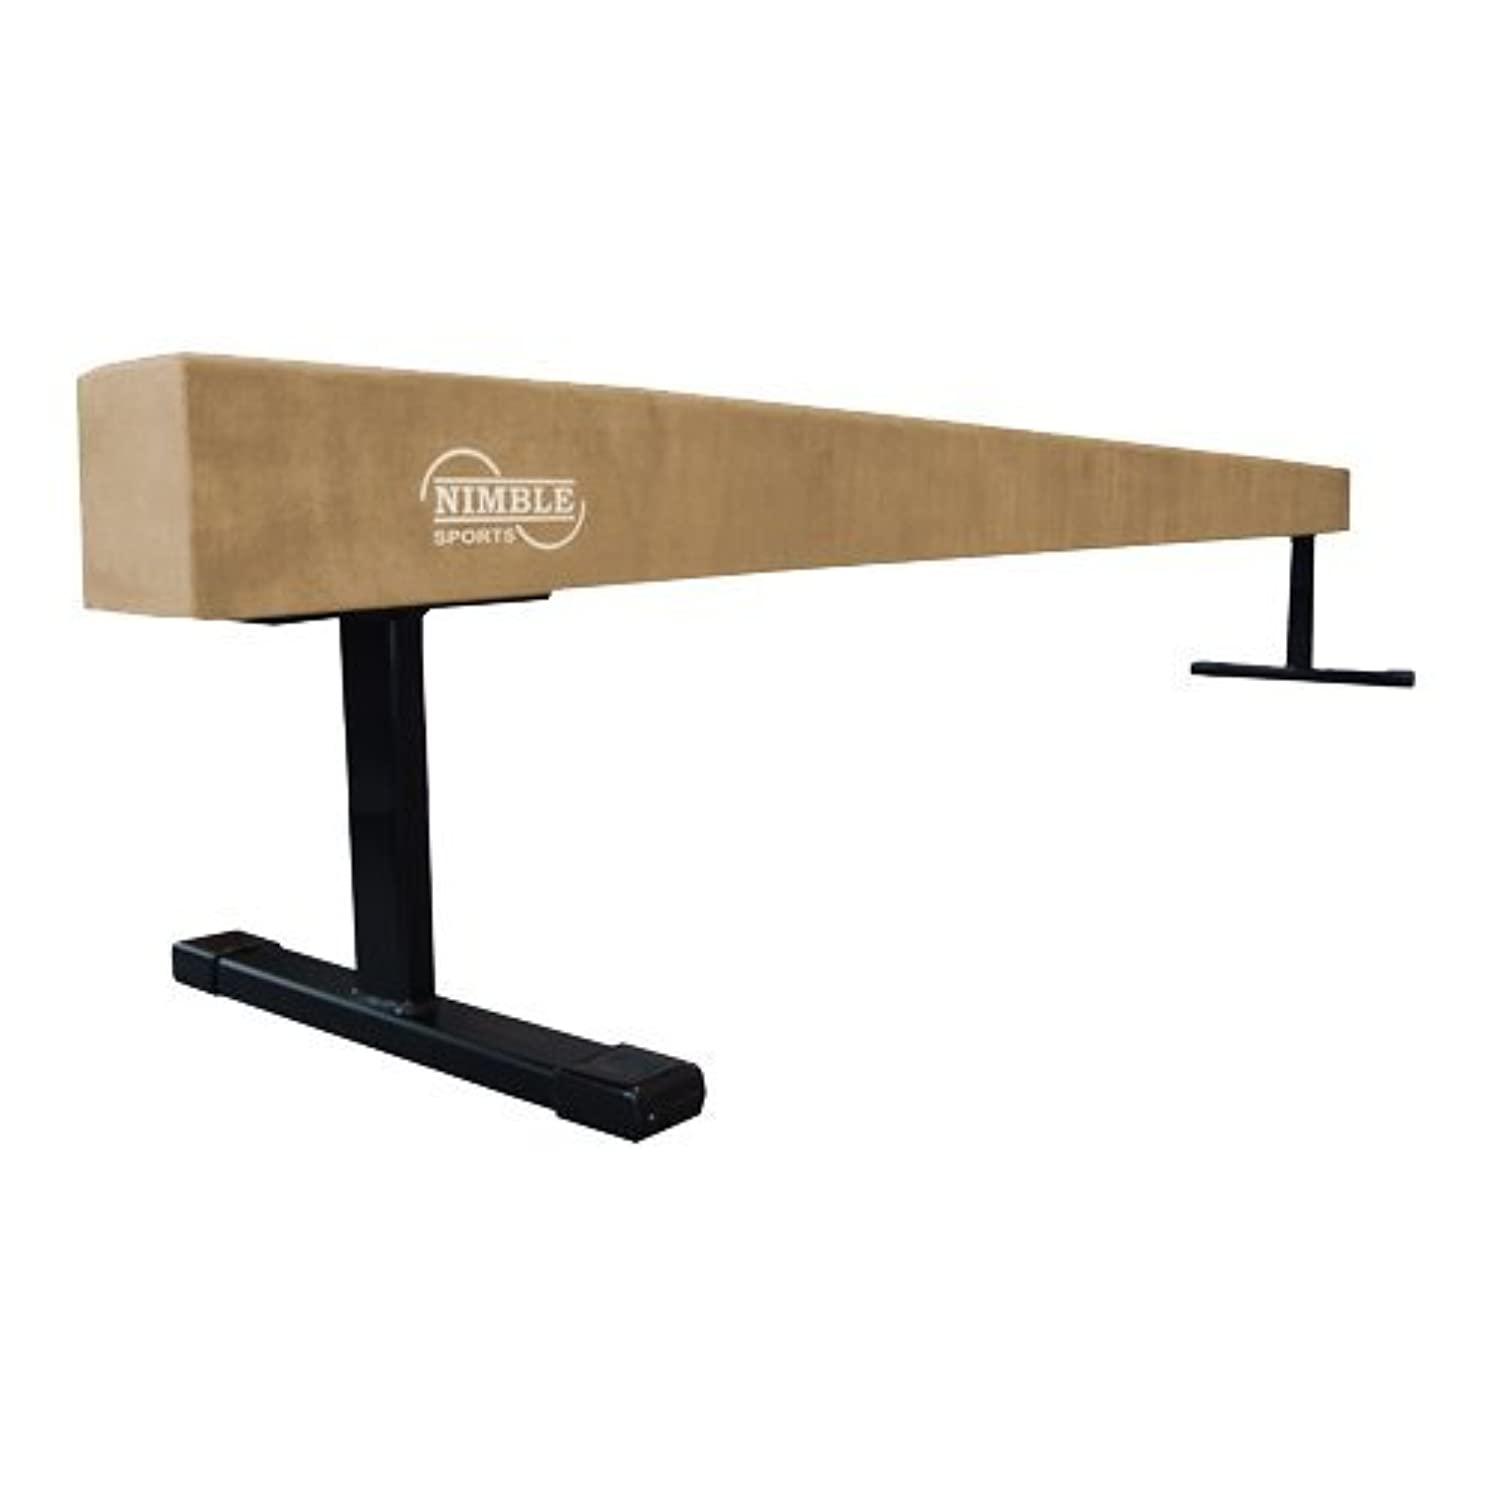 Nimble Sports Tan Suede Balance Beam, 18 Inches High, 8 Feet Long